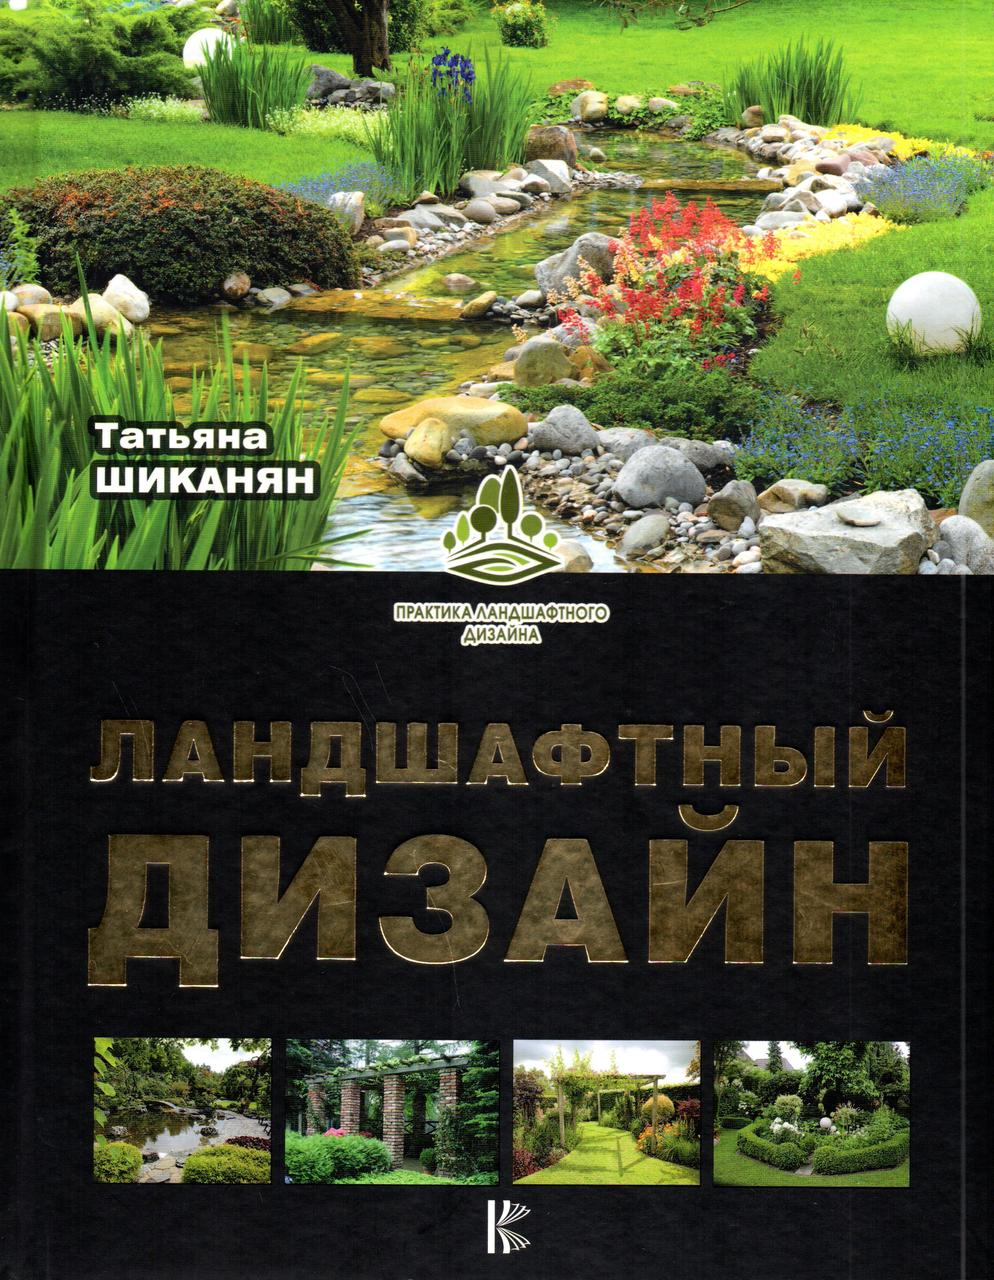 Ландшафтный дизайн. Татьяна Шиканян